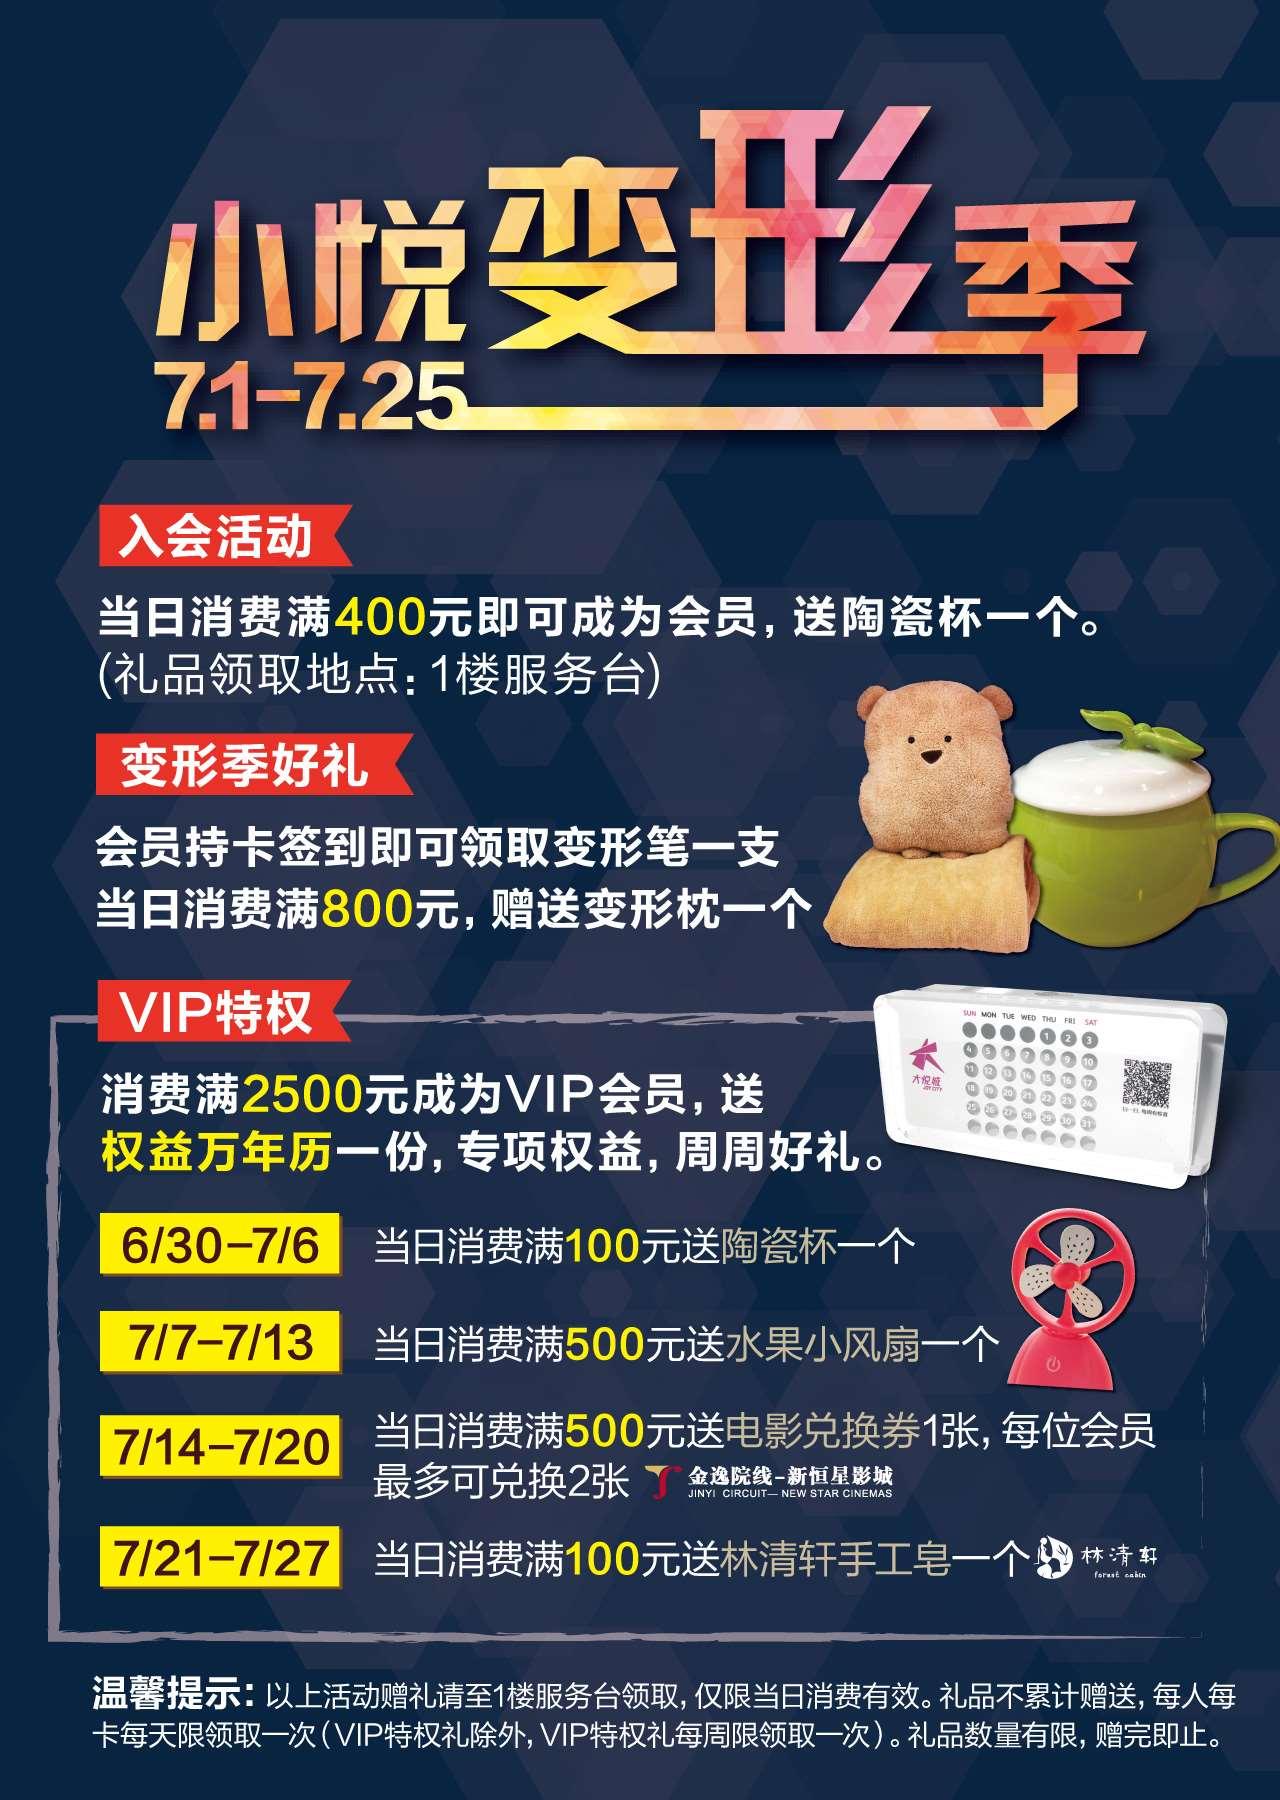 大悦城pr活动海报